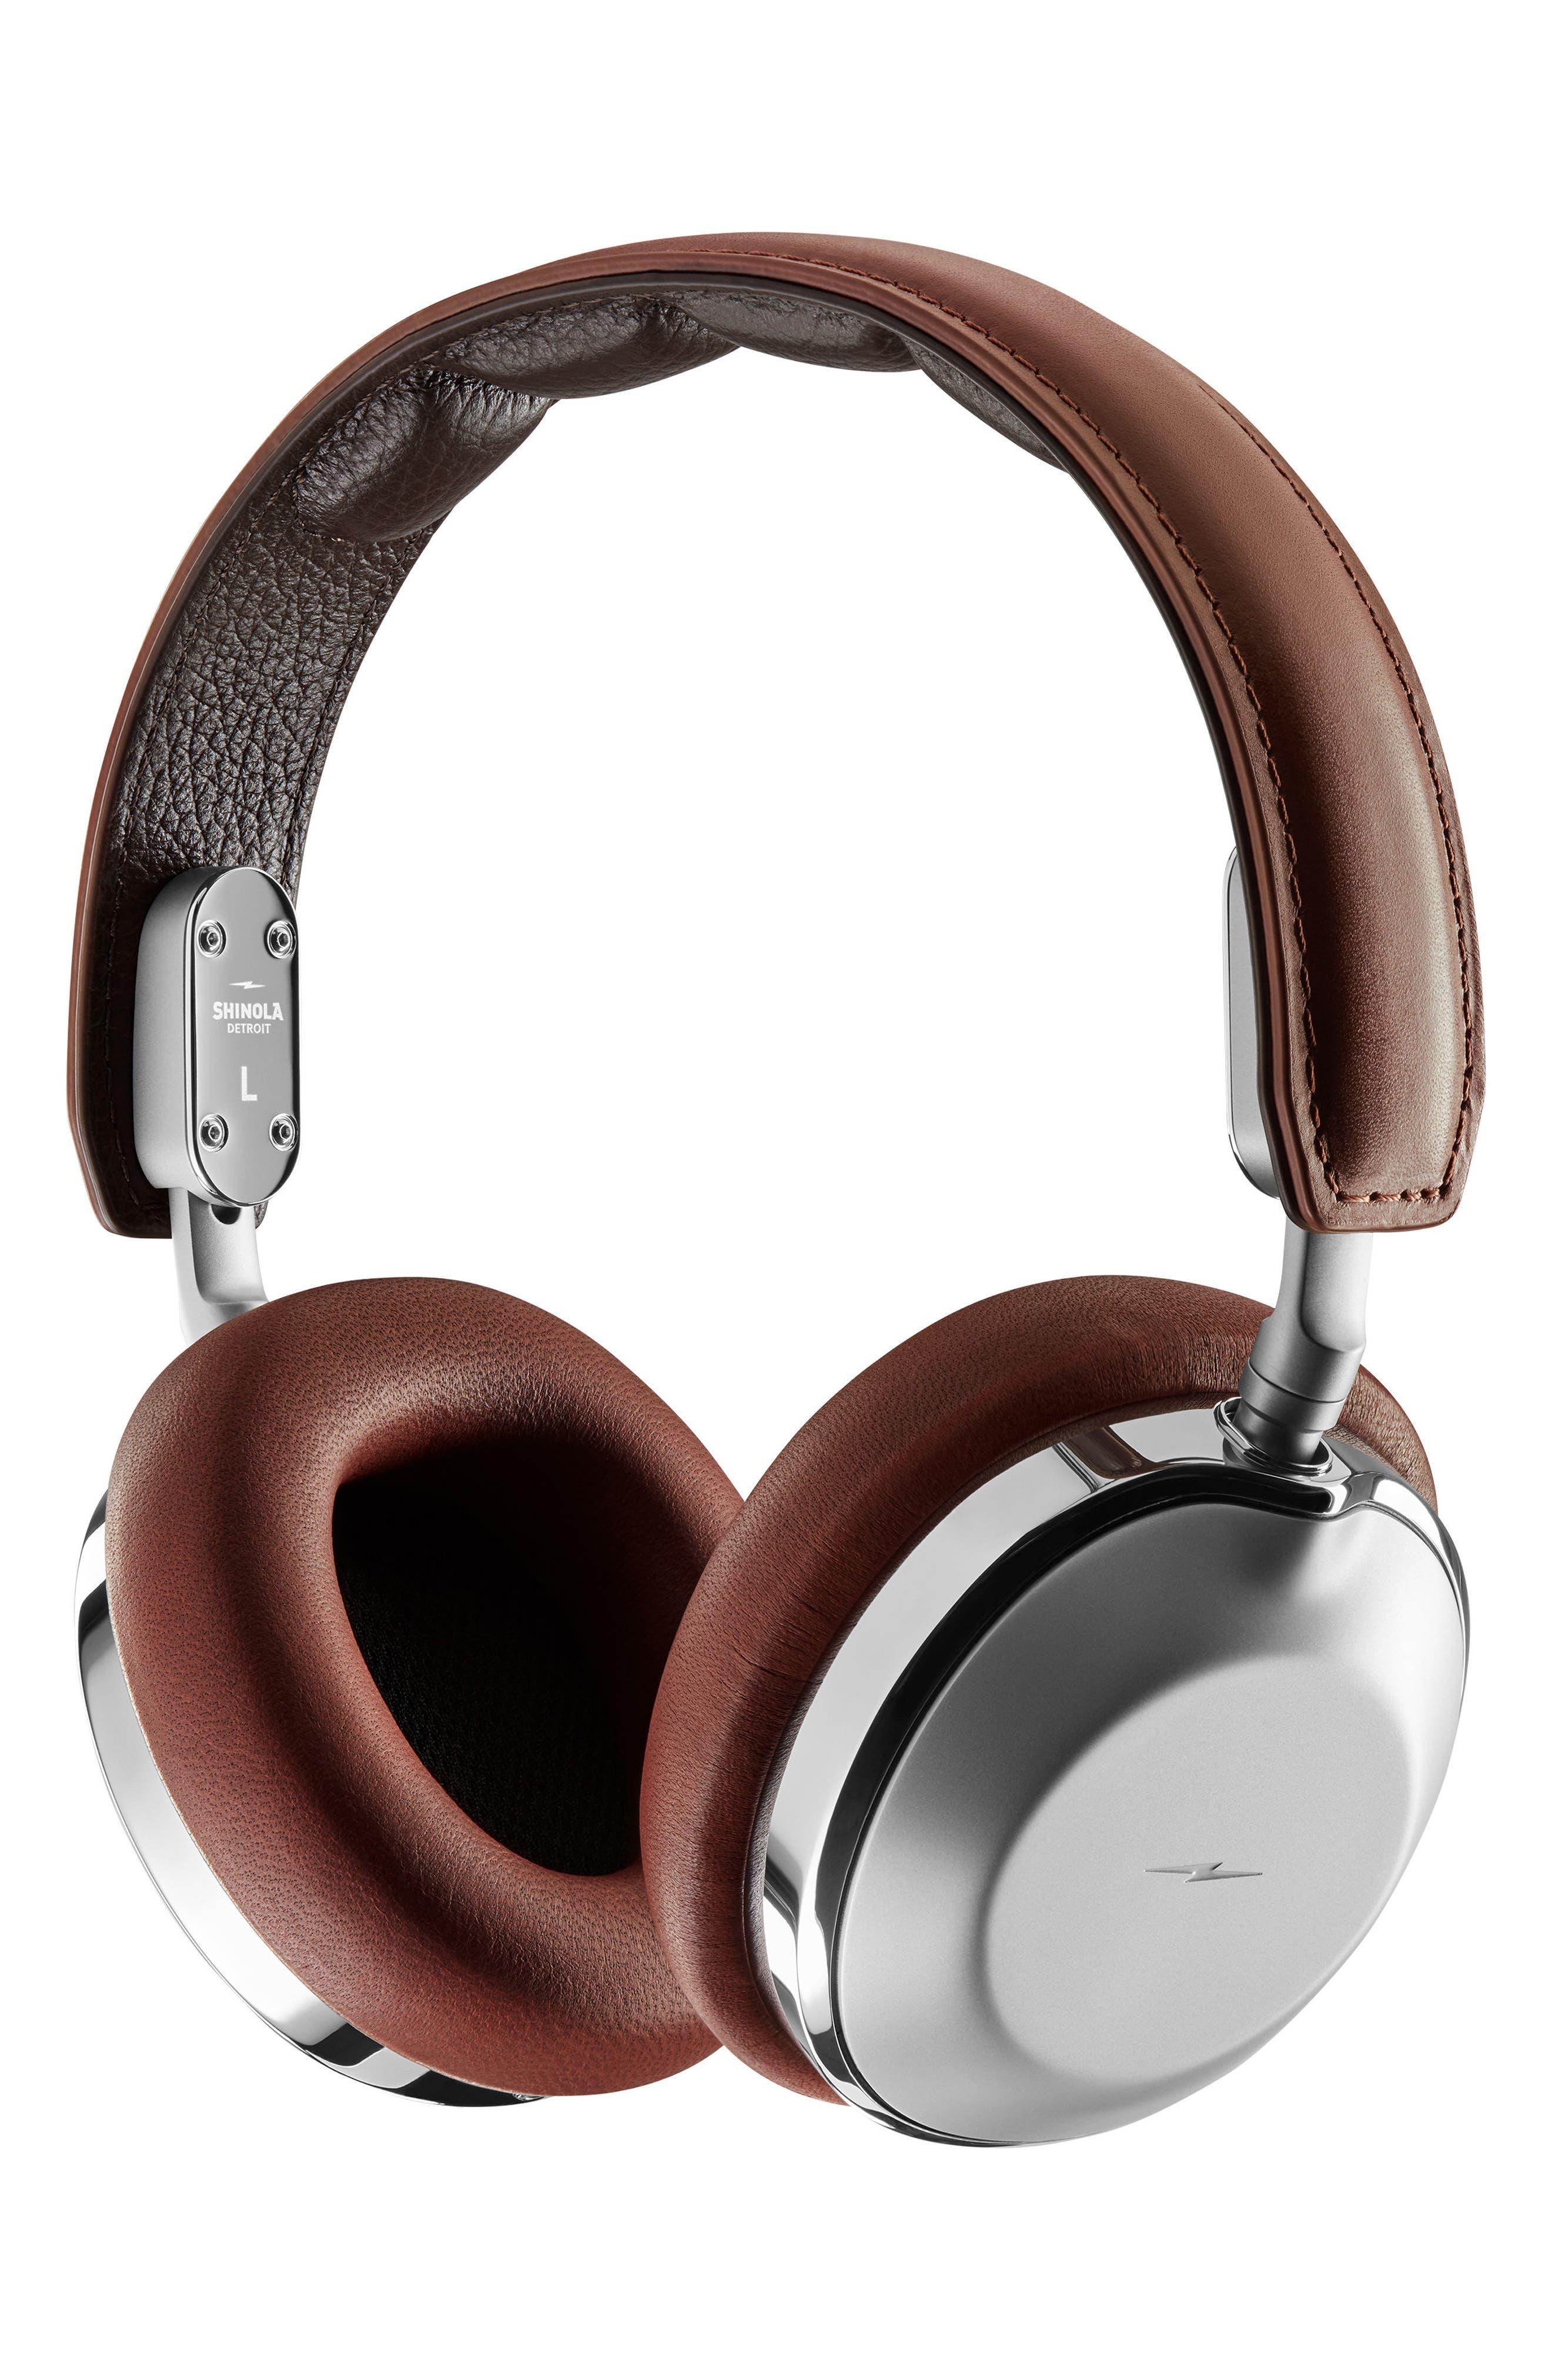 Main Image - Shinola Canfield Over-Ear Headphones